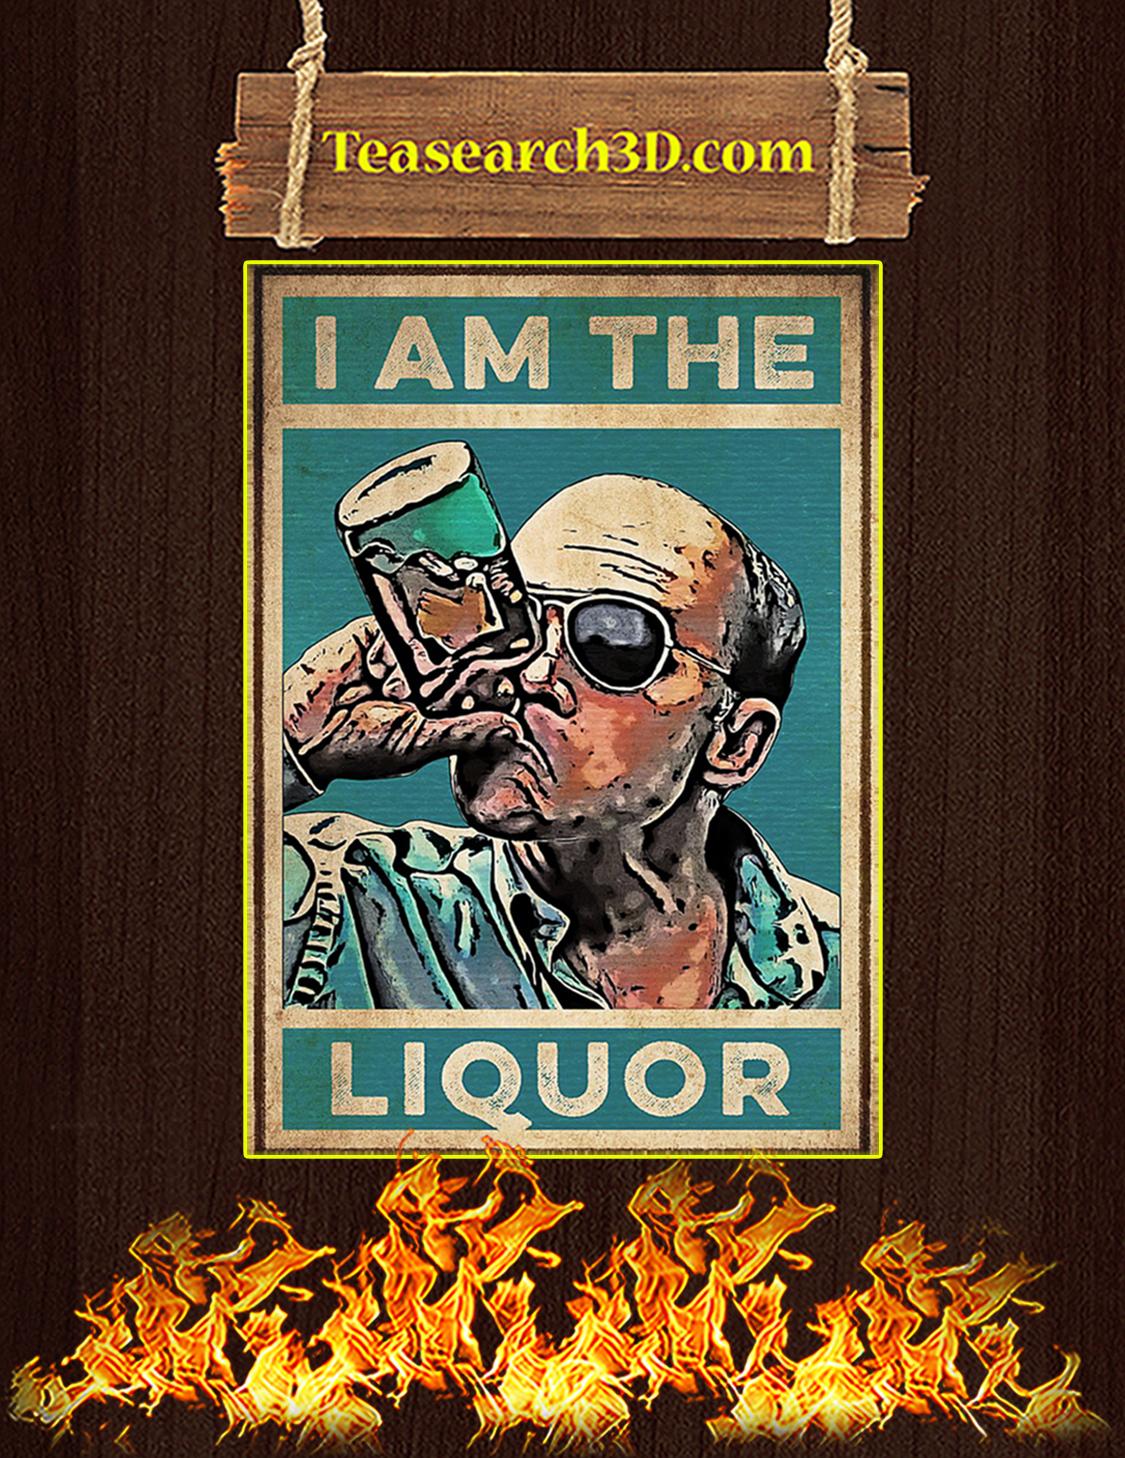 I am the liquor poster A3